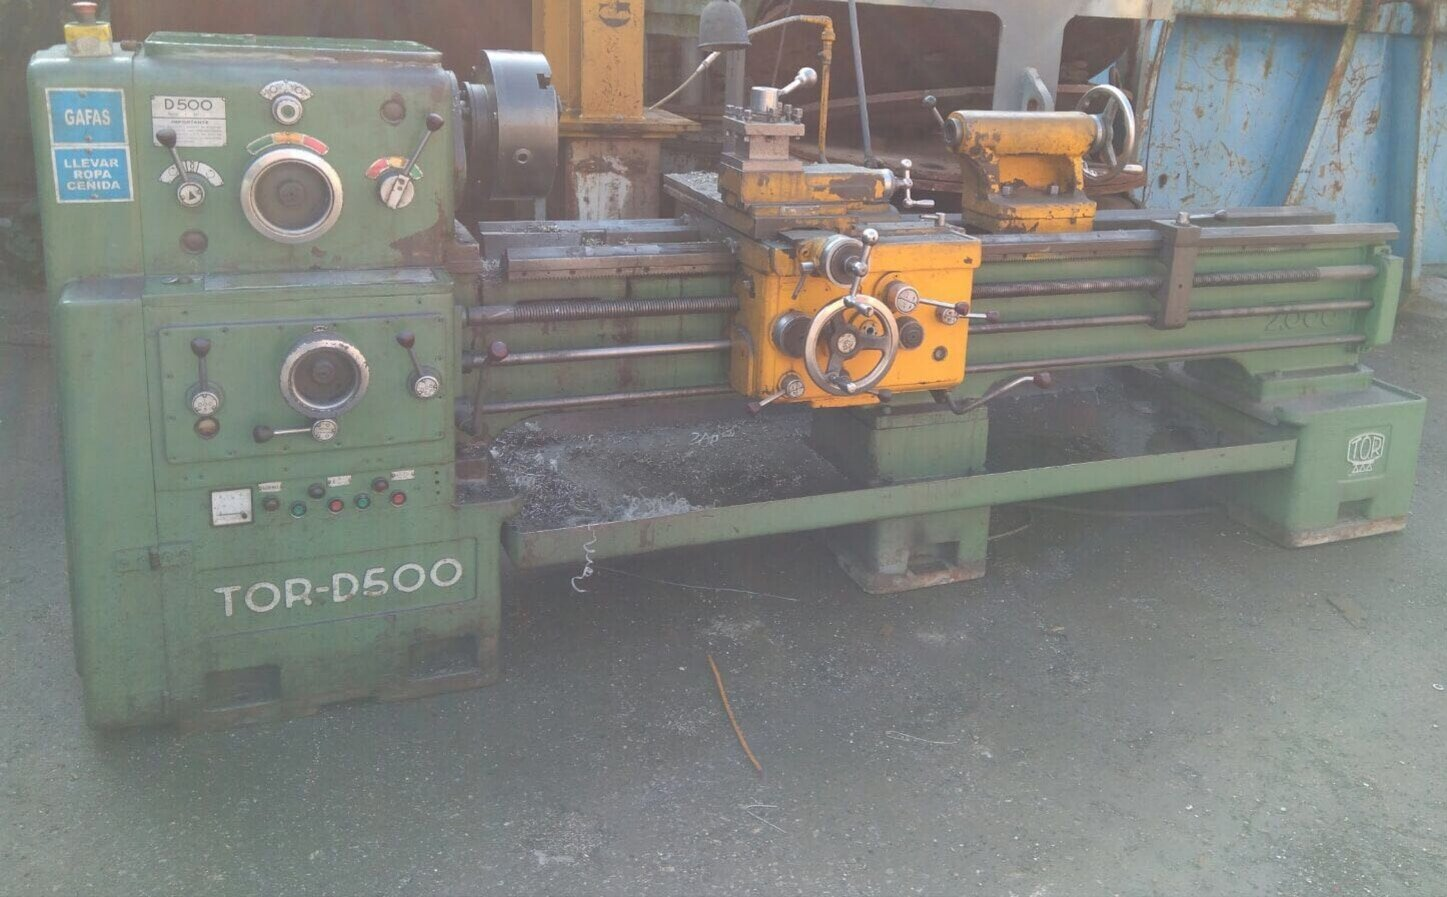 Torno TOR-D500 x 2000